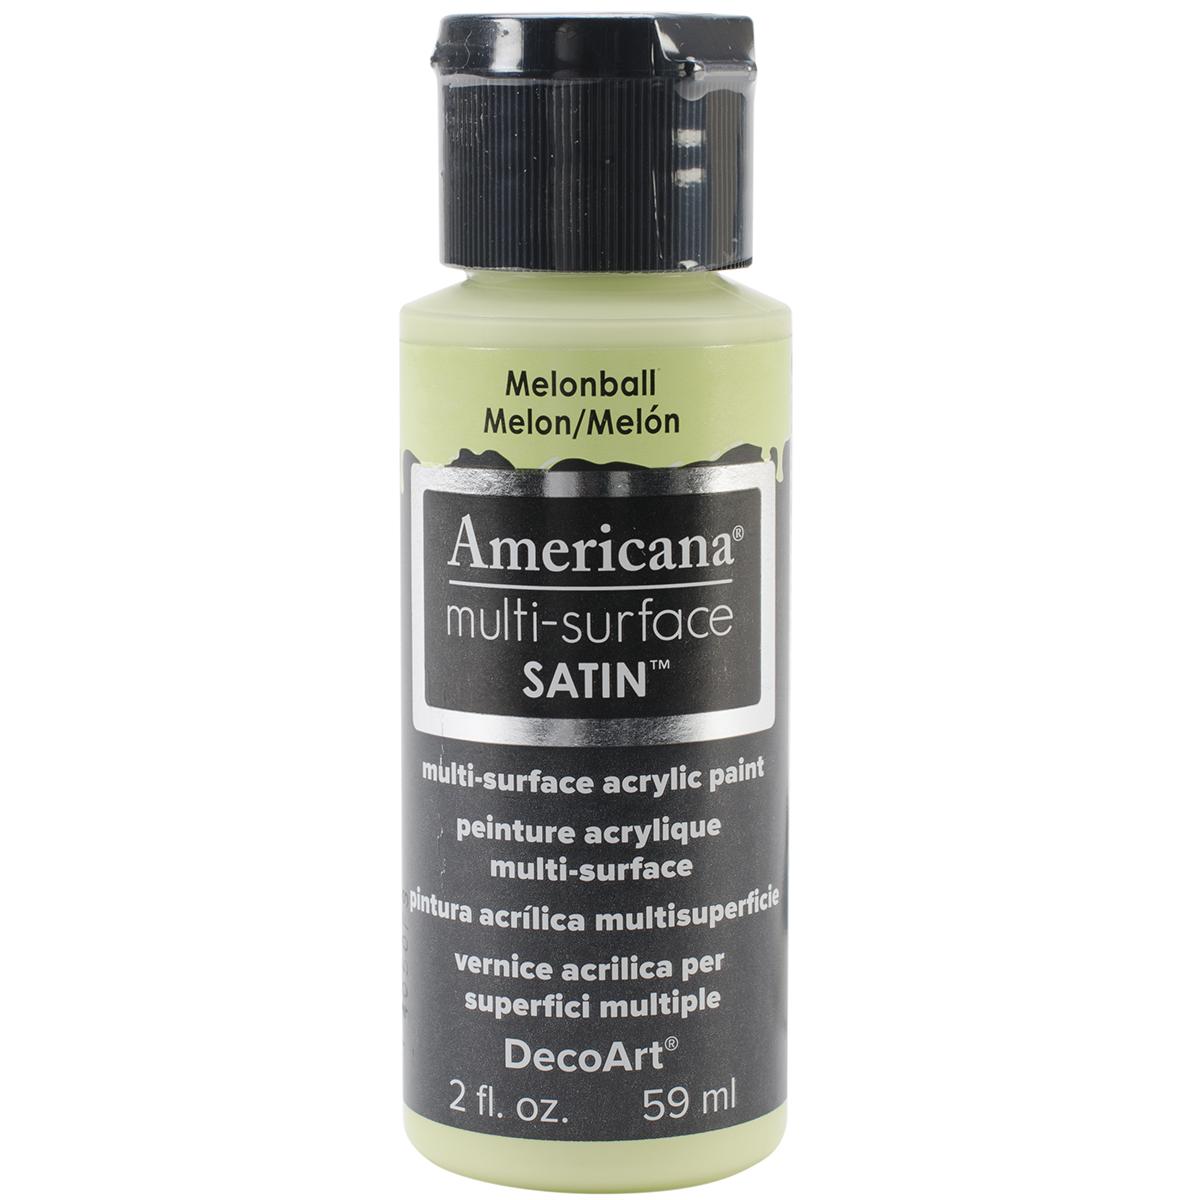 Americana Multi-Surface Satin Acrylic Paint 2oz-Melonball